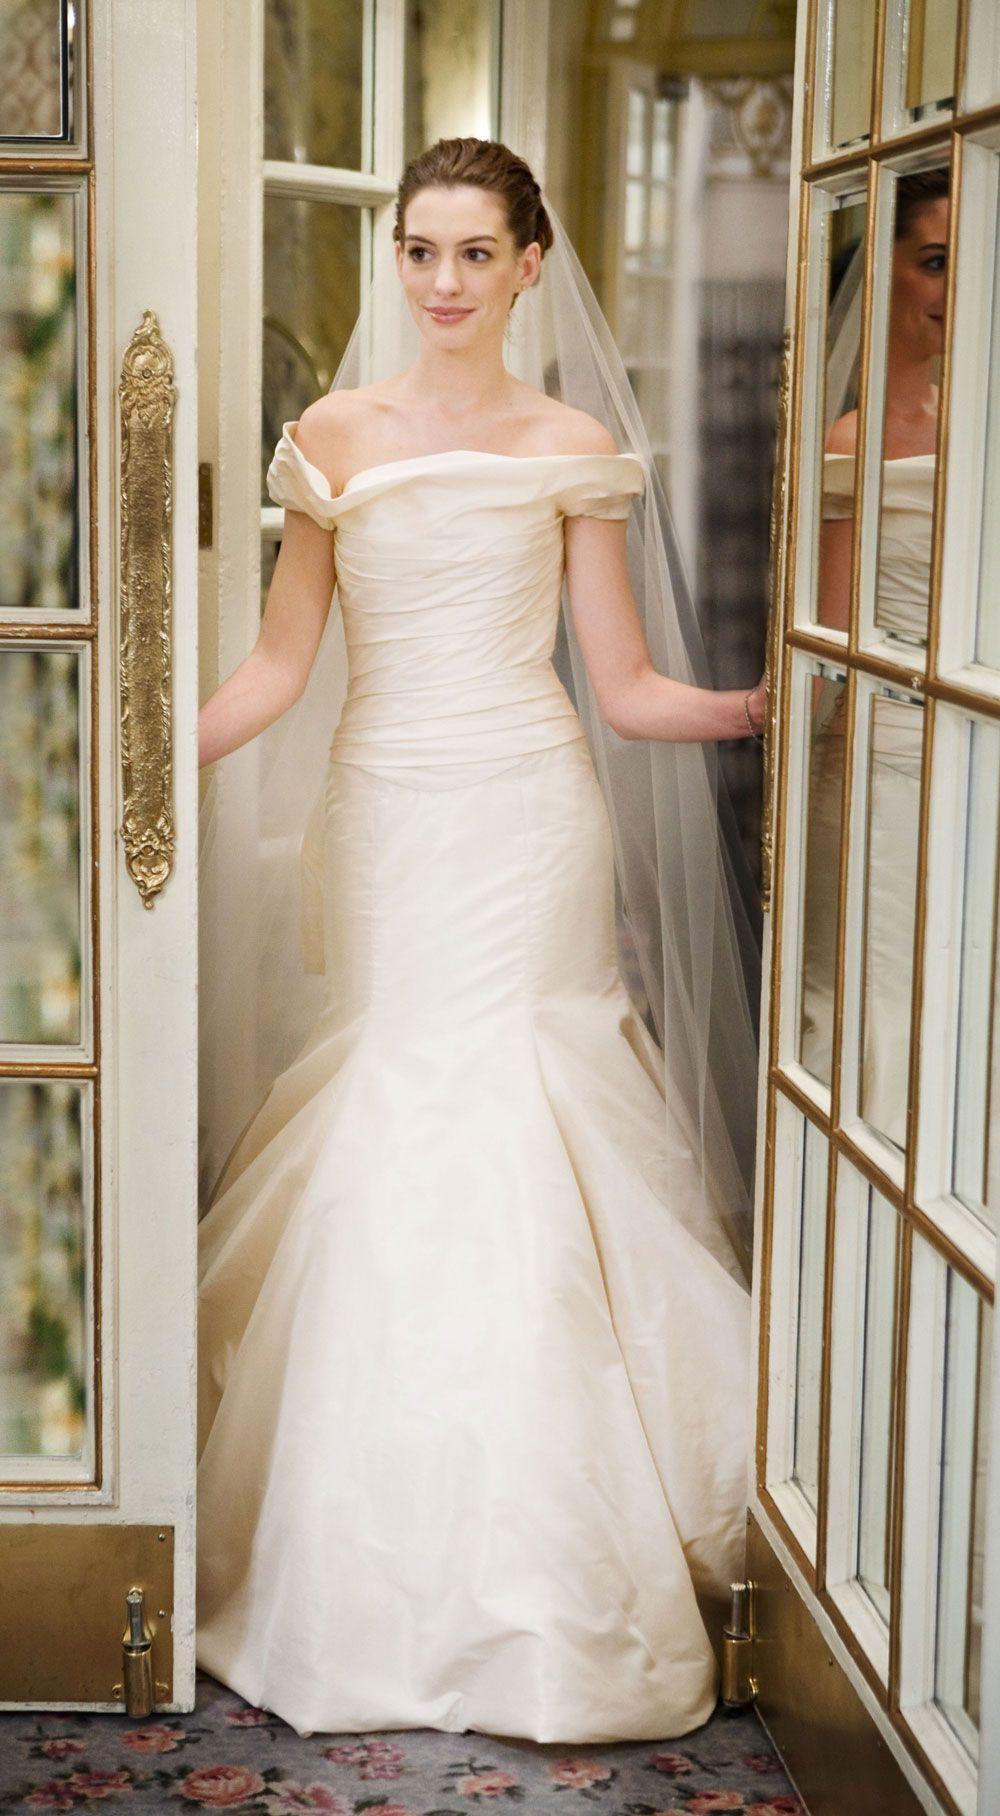 The Best Wedding Dresses In Filmovies Sigh Celebrity Film